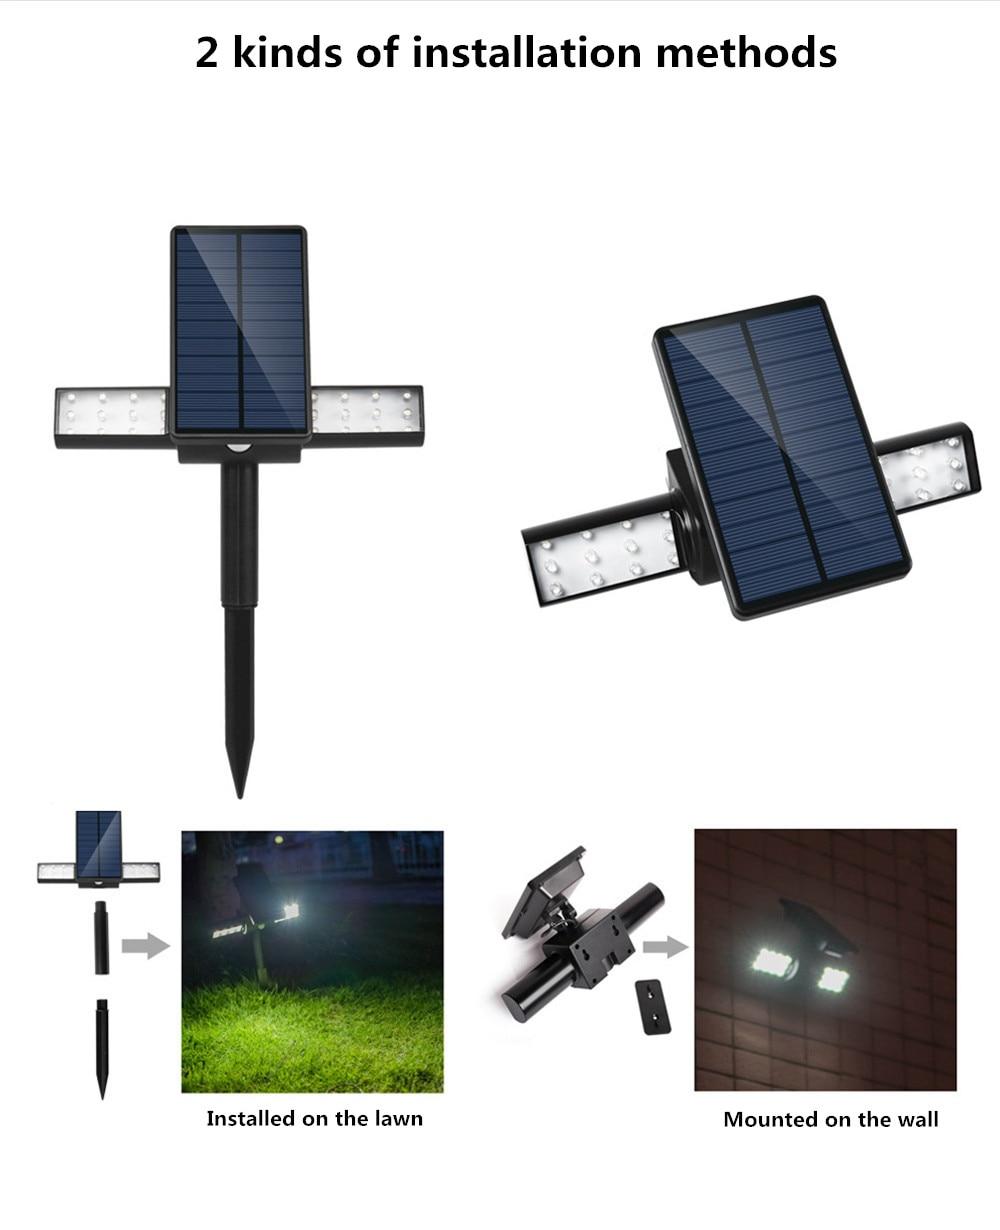 Newest Design Solar Wall Light 24 LED 2000mAh Auto PIR Motion Sensor Garden Wall Solar Lamp For Outdoor Waterproof Lighting